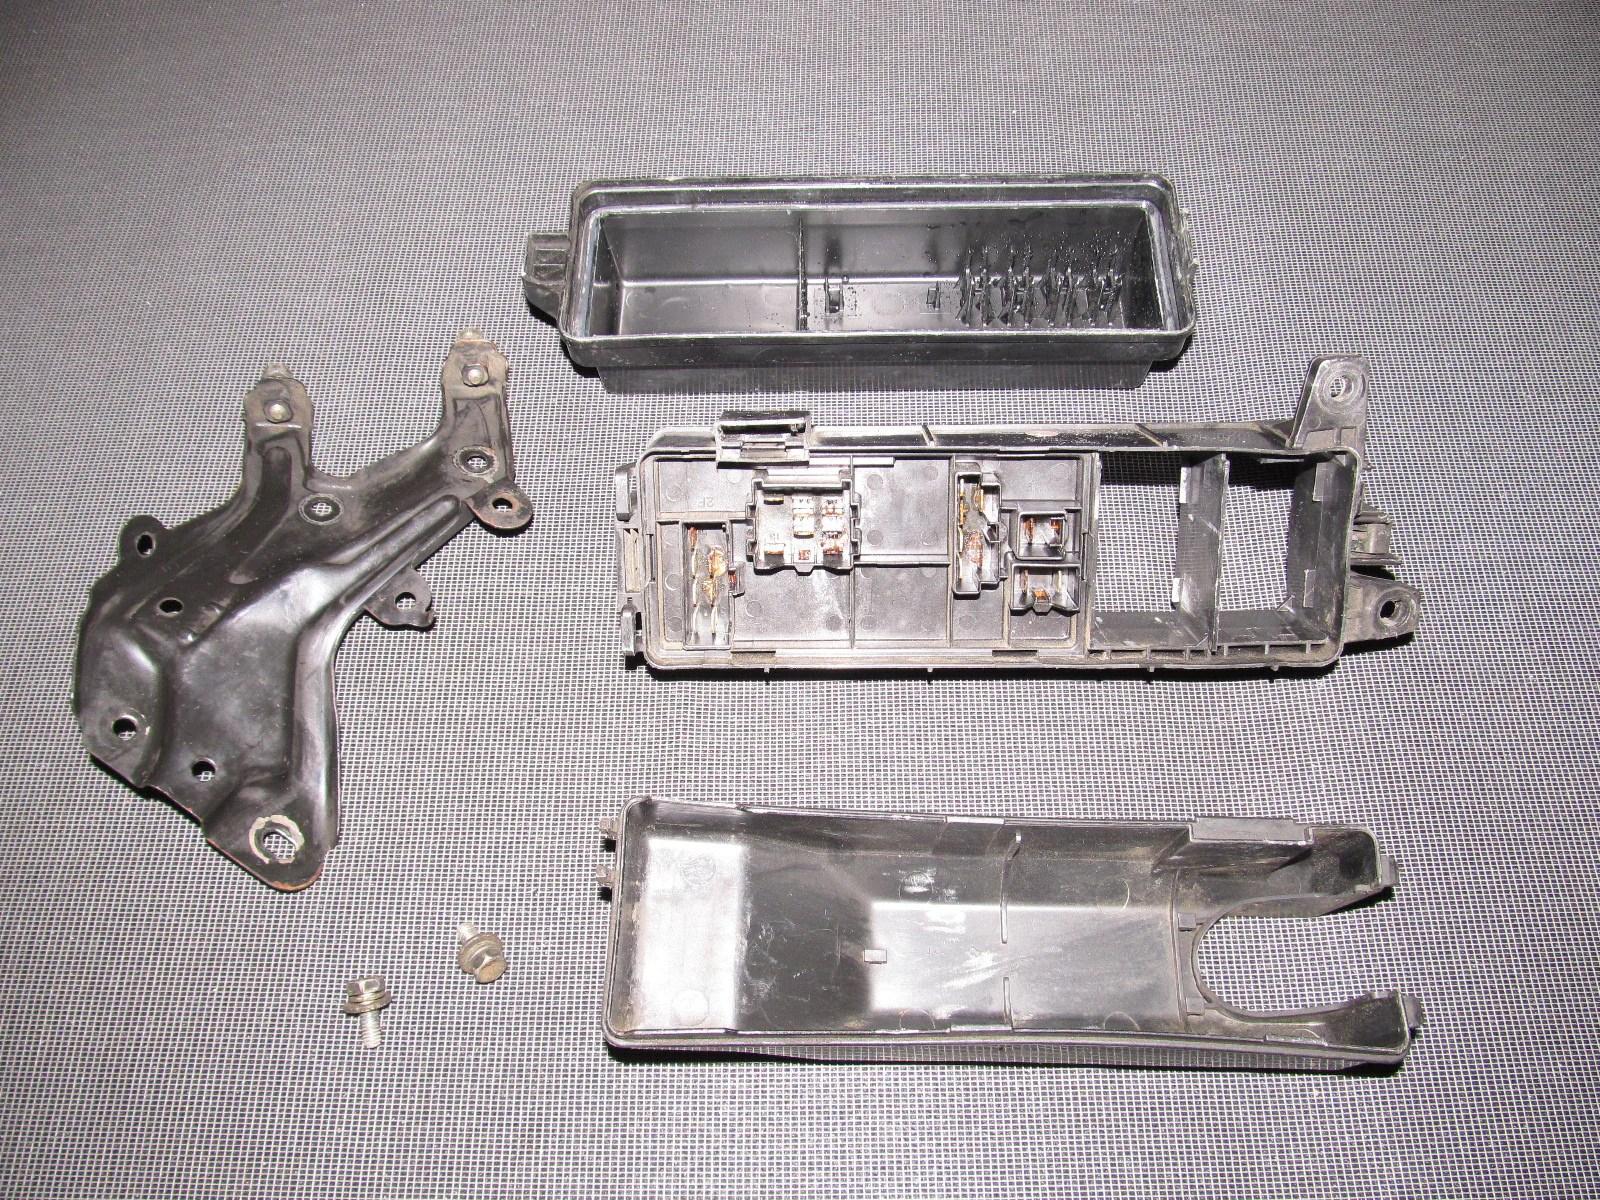 medium resolution of 89 90 91 92 toyota supra oem engine fuse box autopartone com 1987 toyota supra fuse